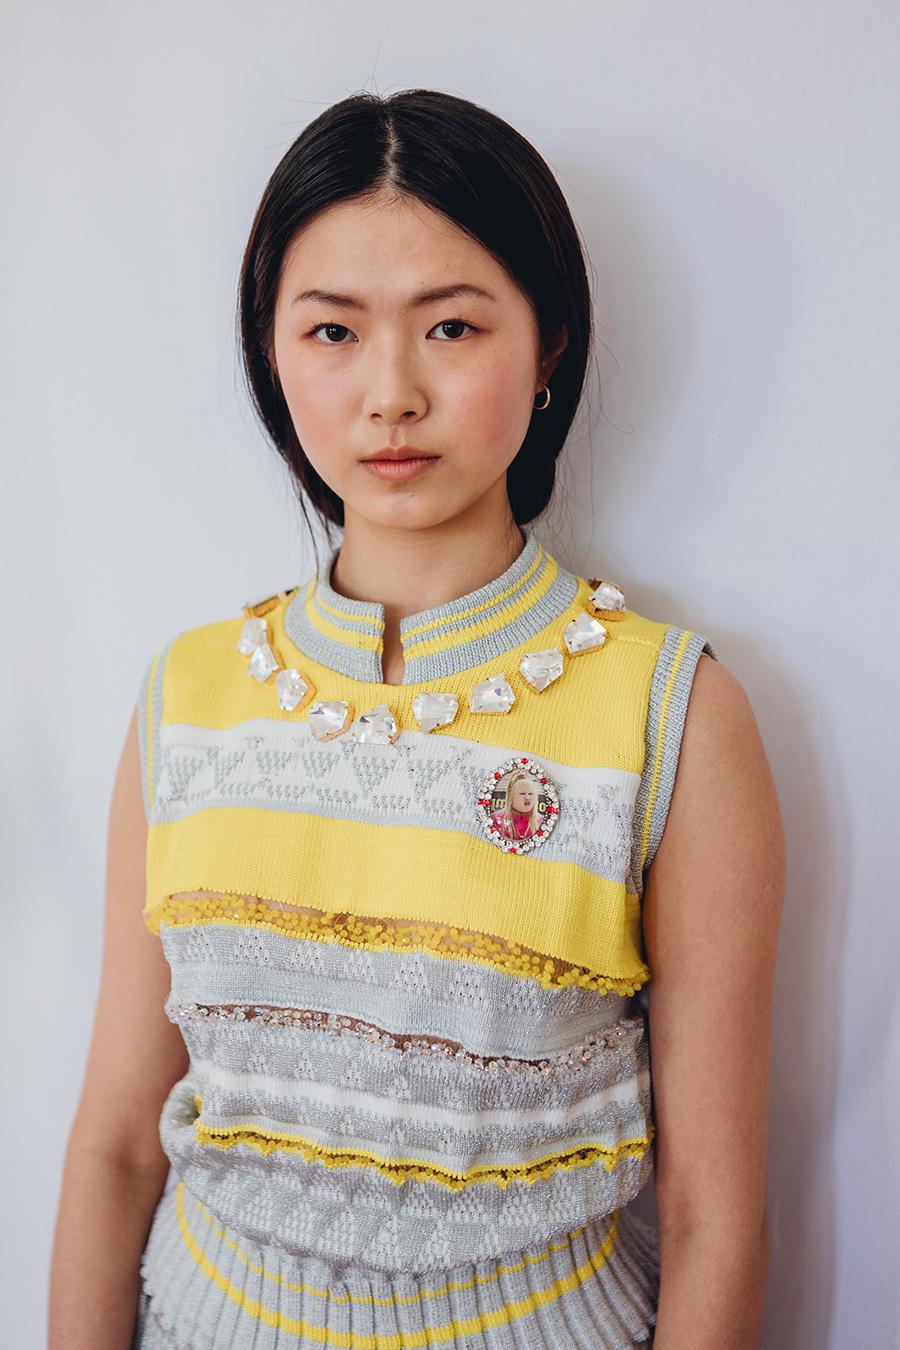 Photographer: Jordan Munns Models: Boa Chen, Anneke De Vries Makeup: Maggie Wu